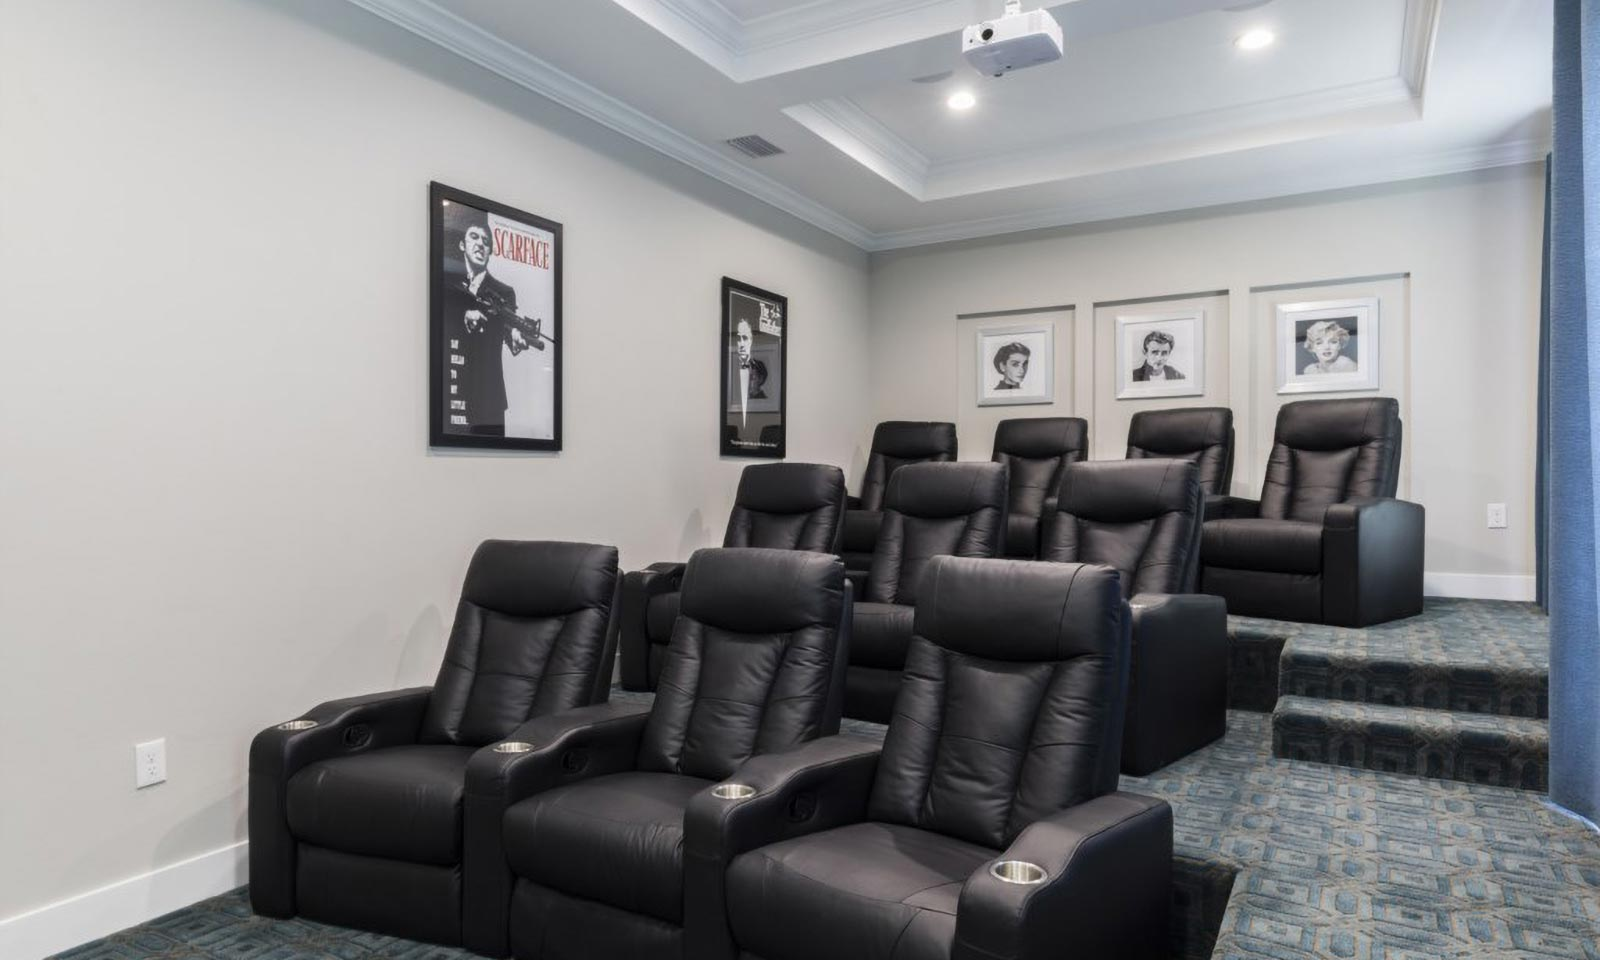 [amenities:Theater-Room:1]Theater Room